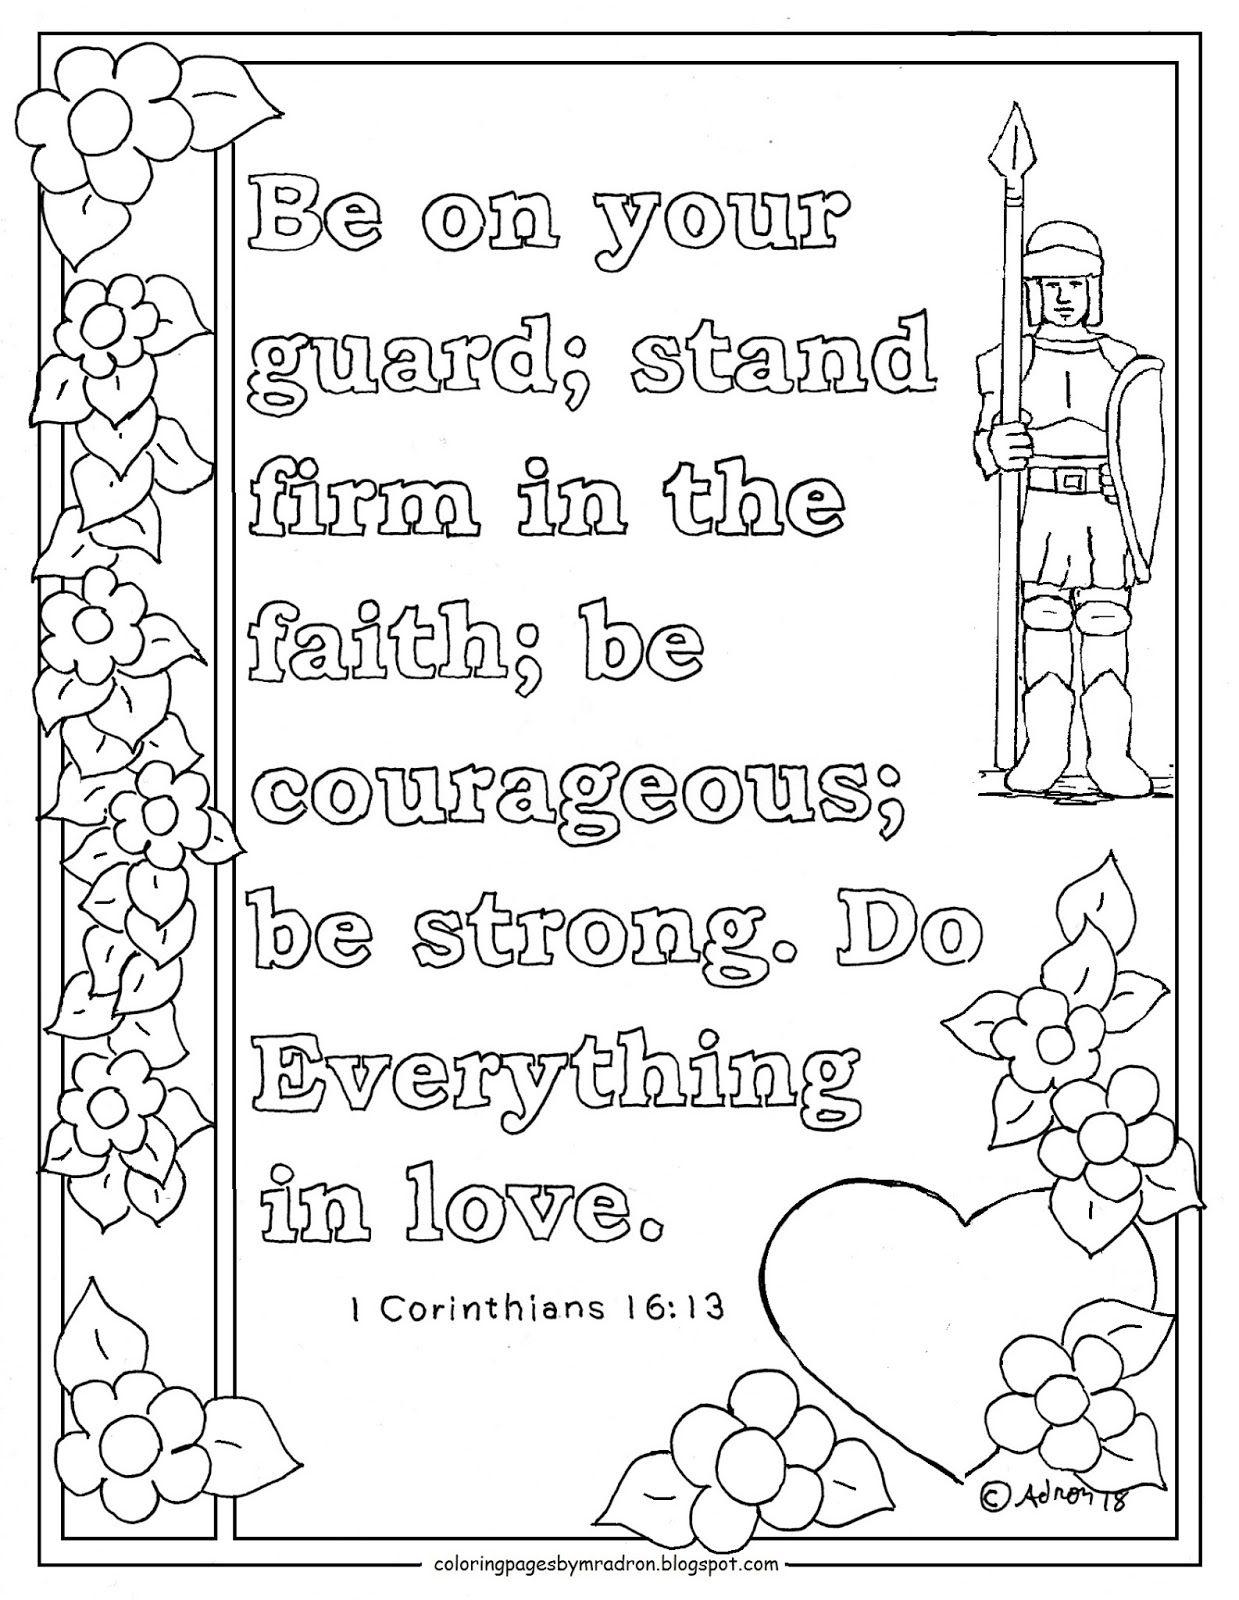 1 Corinthians 16 13 Jpg 1 239 1 600 Pixels 1 Corinthians 16 13